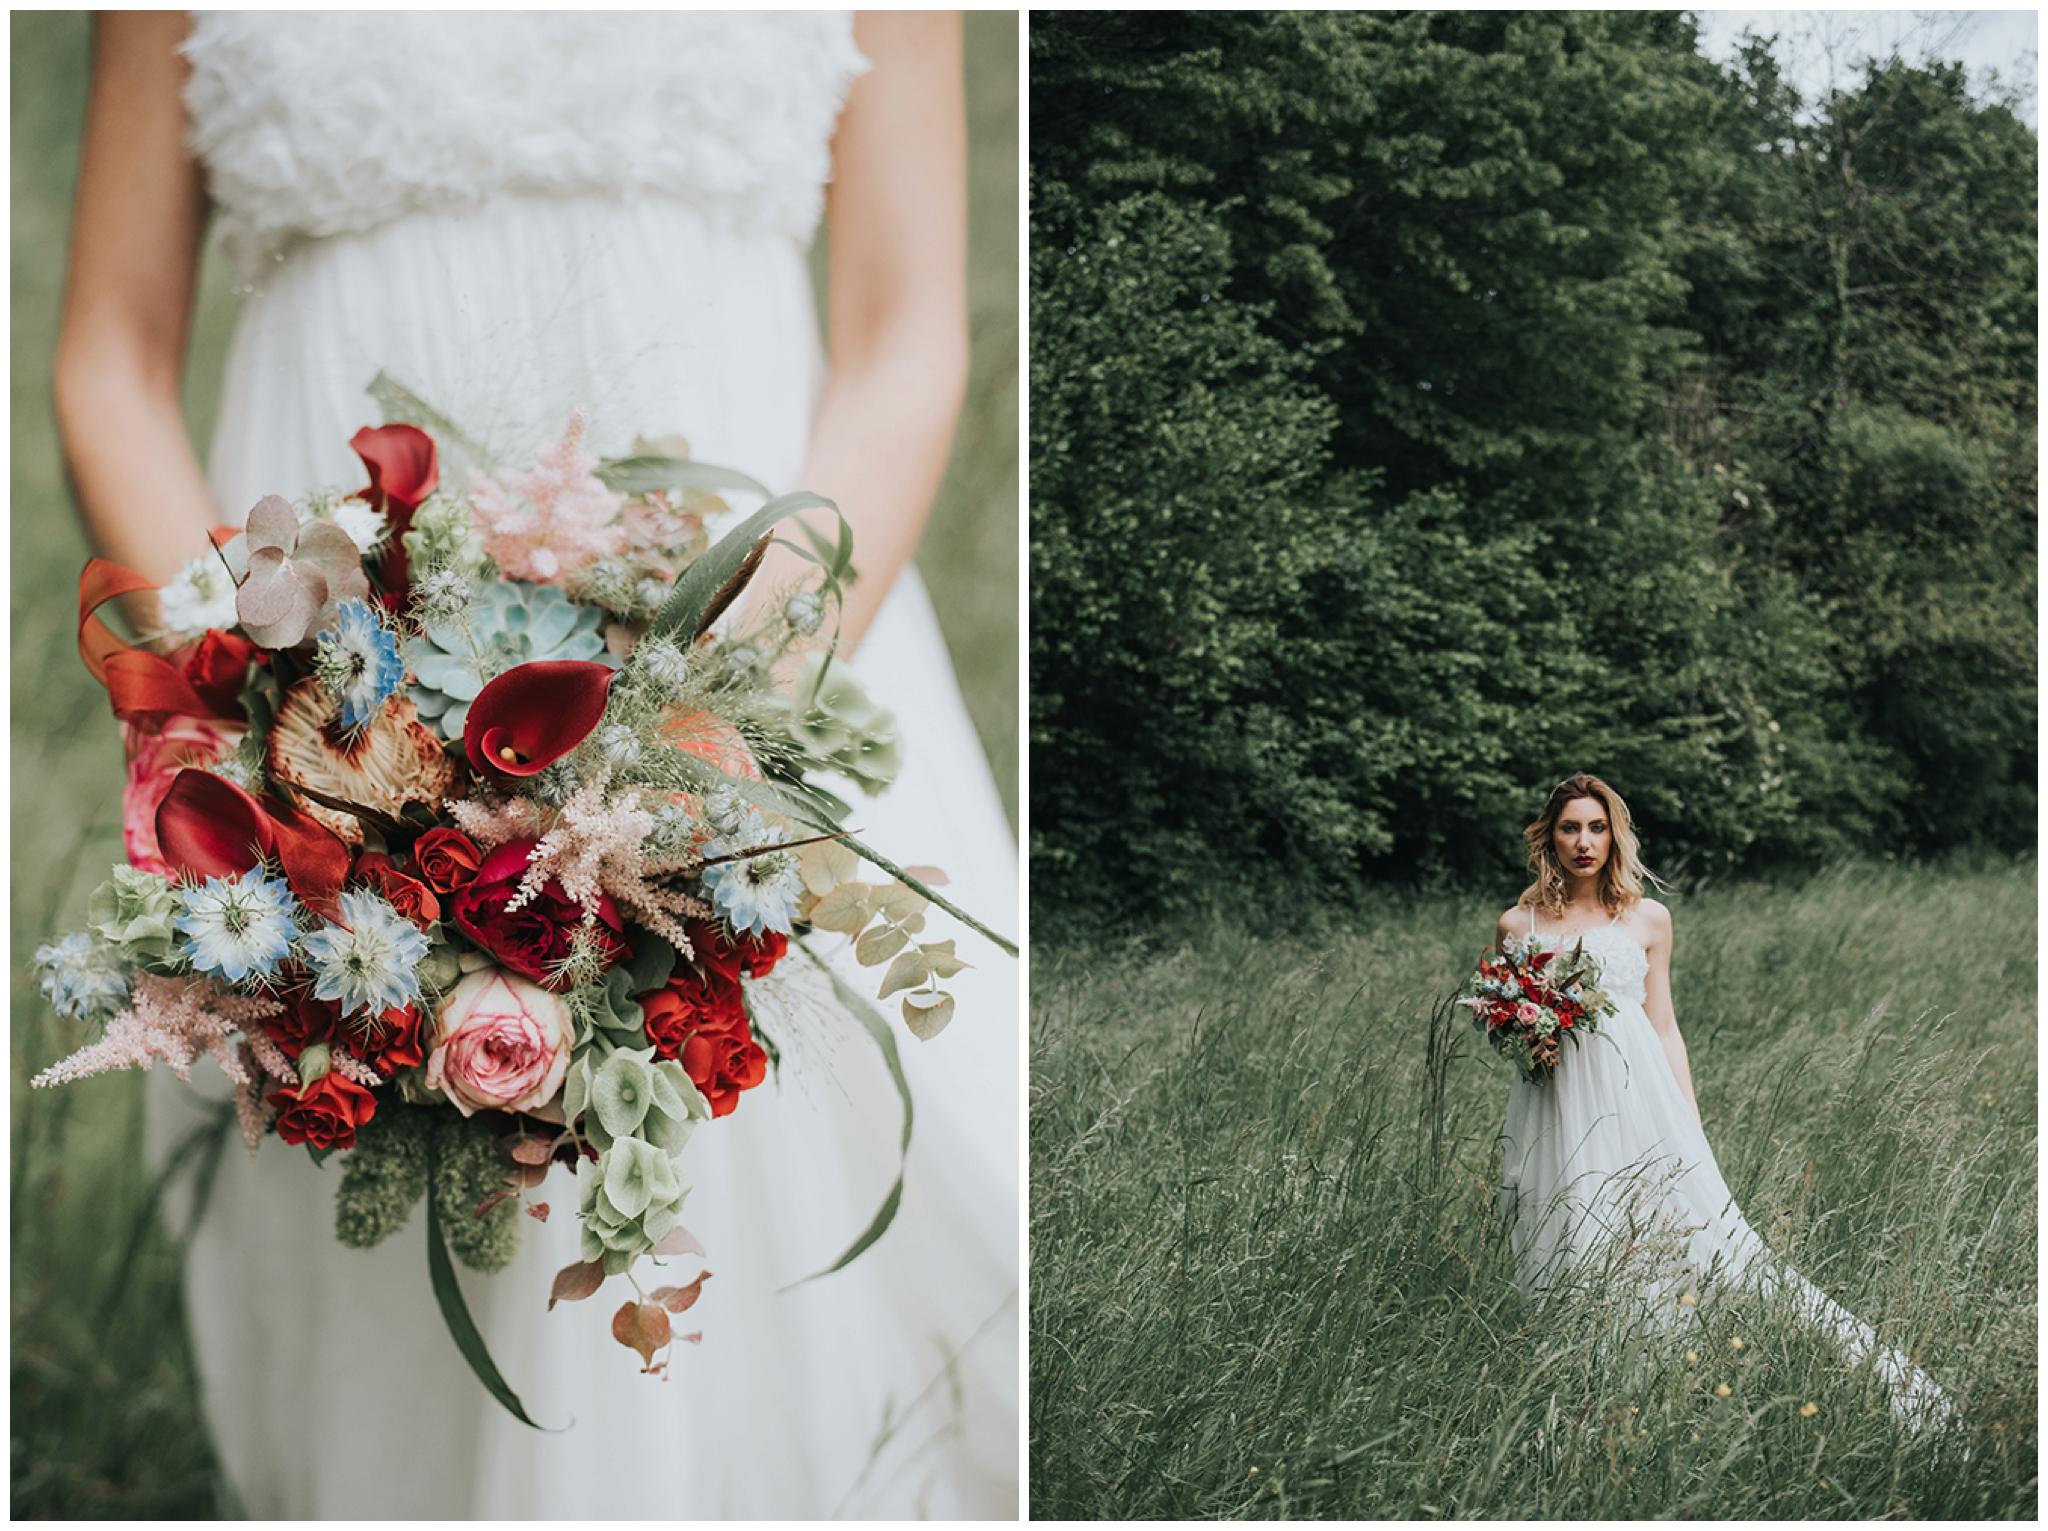 photographe-mariage-grenoble-annecy-lyon-shooting-inspiration-boheme-043